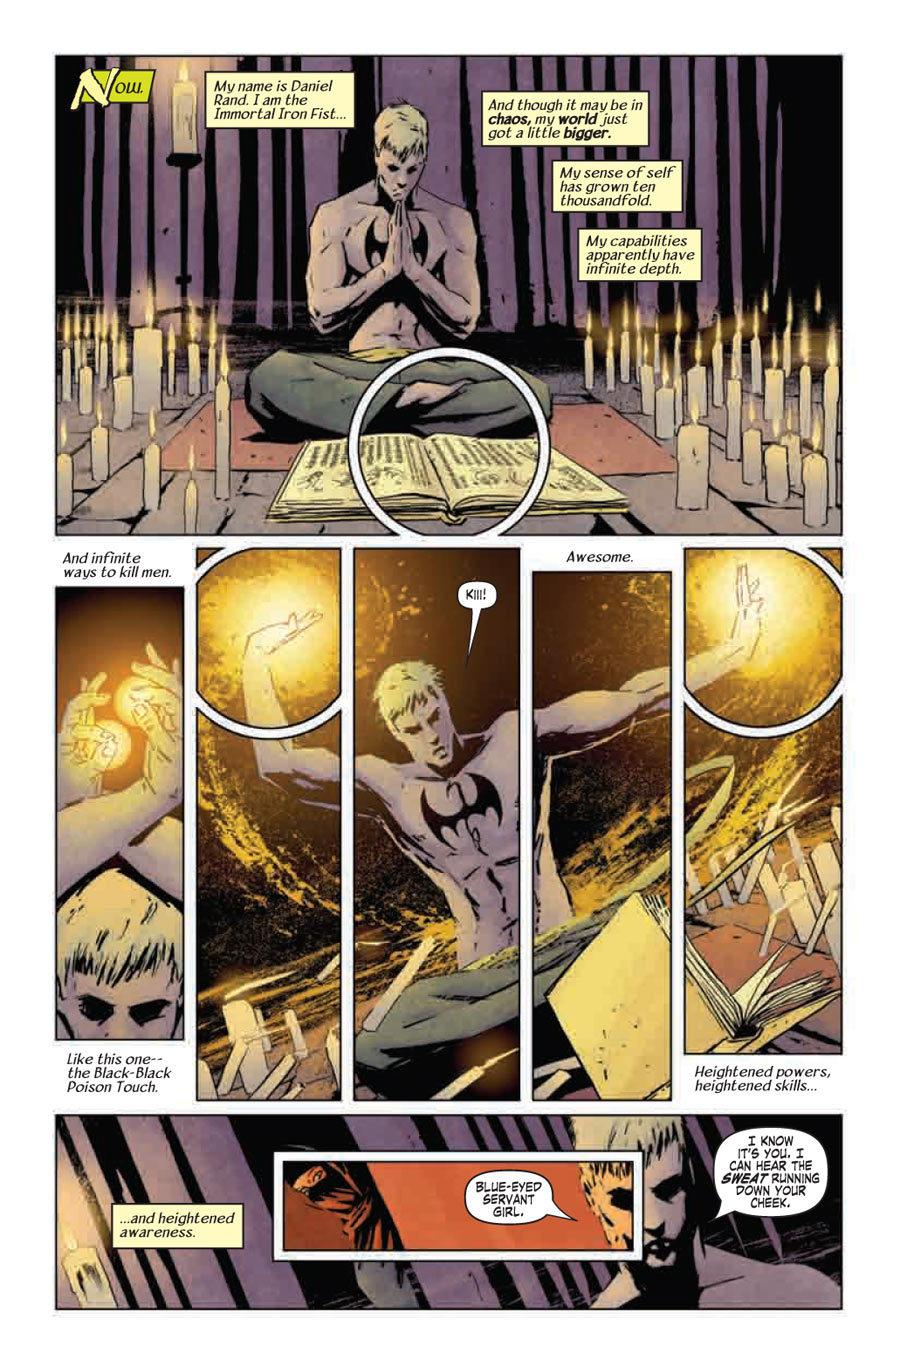 'The Immortal Iron Fist' #9 by Ed Brubaker and Matt Fraction